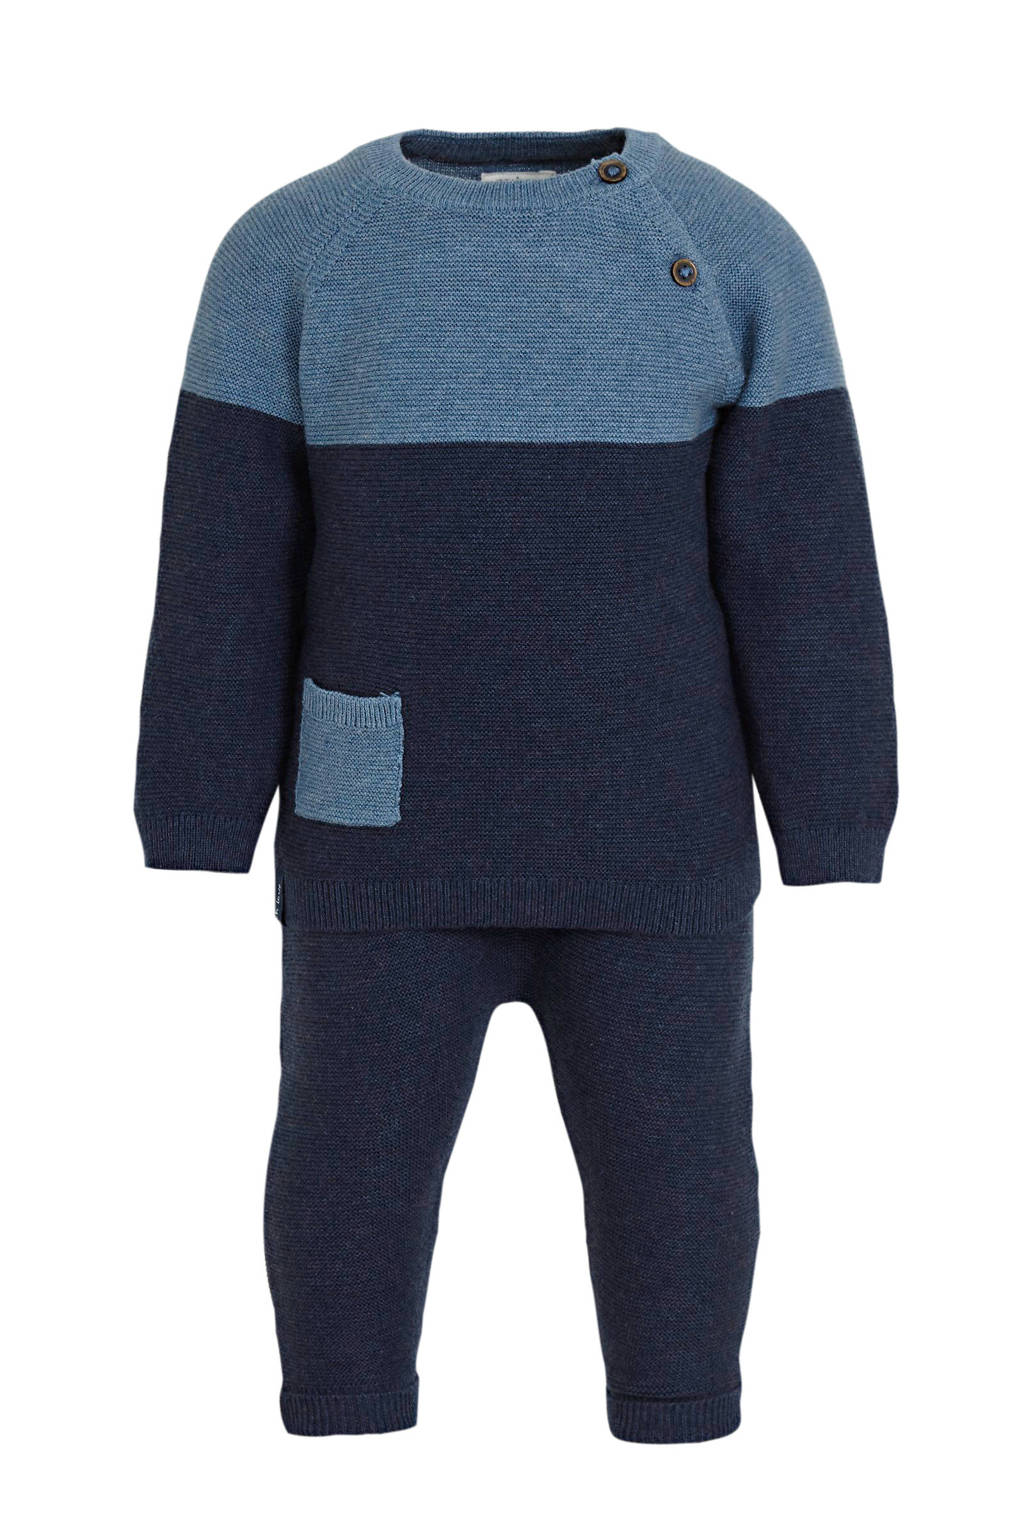 C&A Baby Club trui + broek donkerblauw, Donkerblauw/blauw